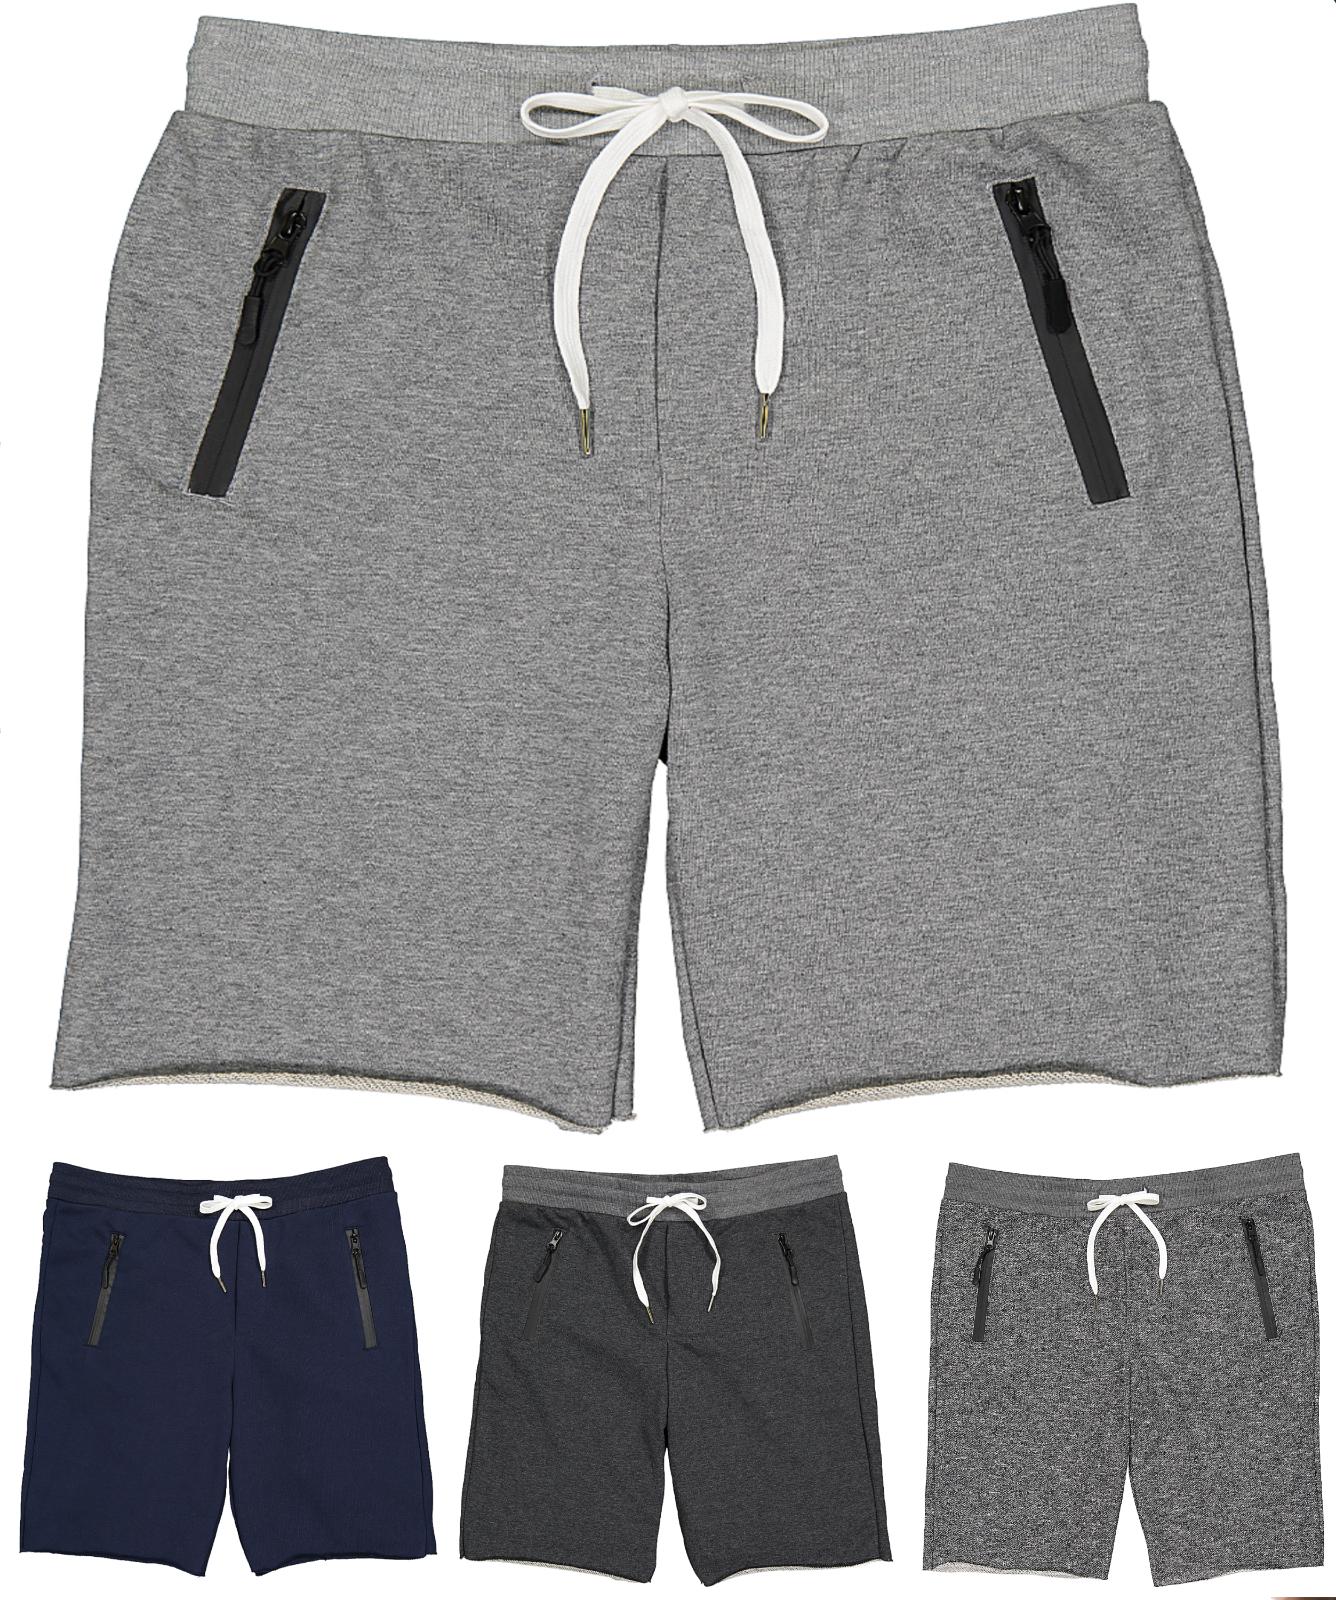 Men's Sport Shorts Gym Shorts Fitness Workout Sweat Pants Jo